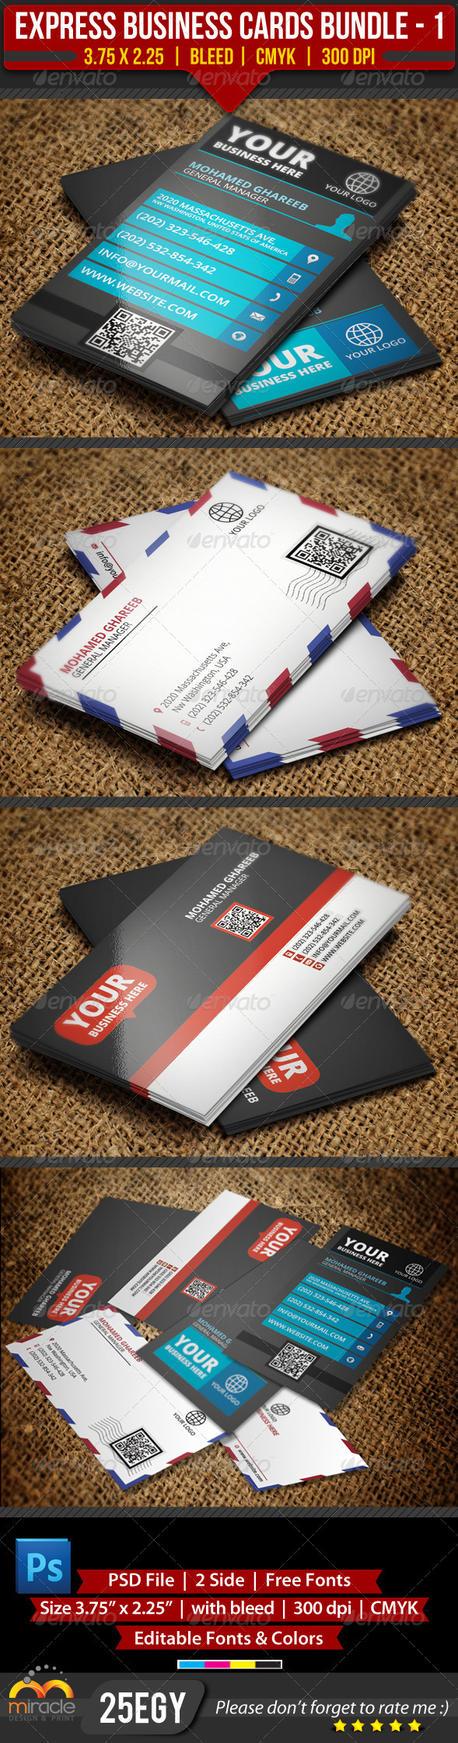 Express Business Cards Bundle 1 by EgYpToS on DeviantArt